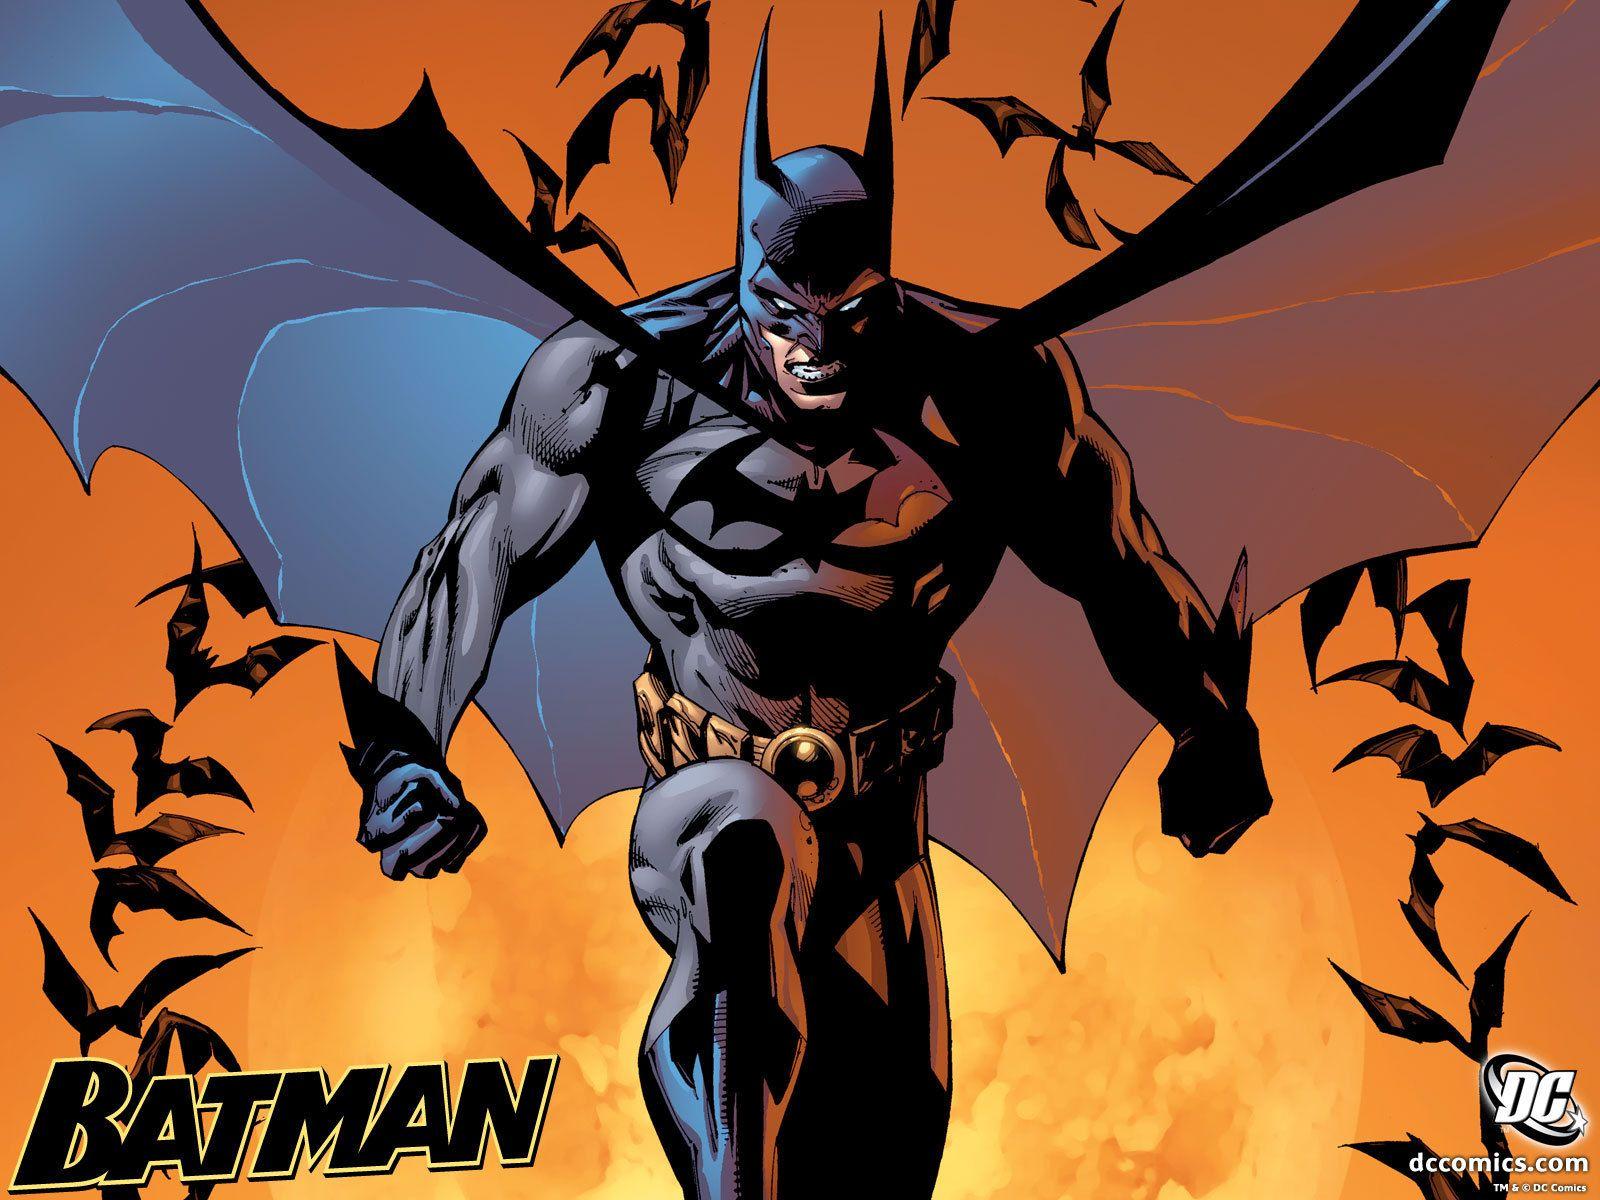 Famous Batman For Free Mac Image Wallpaper Download